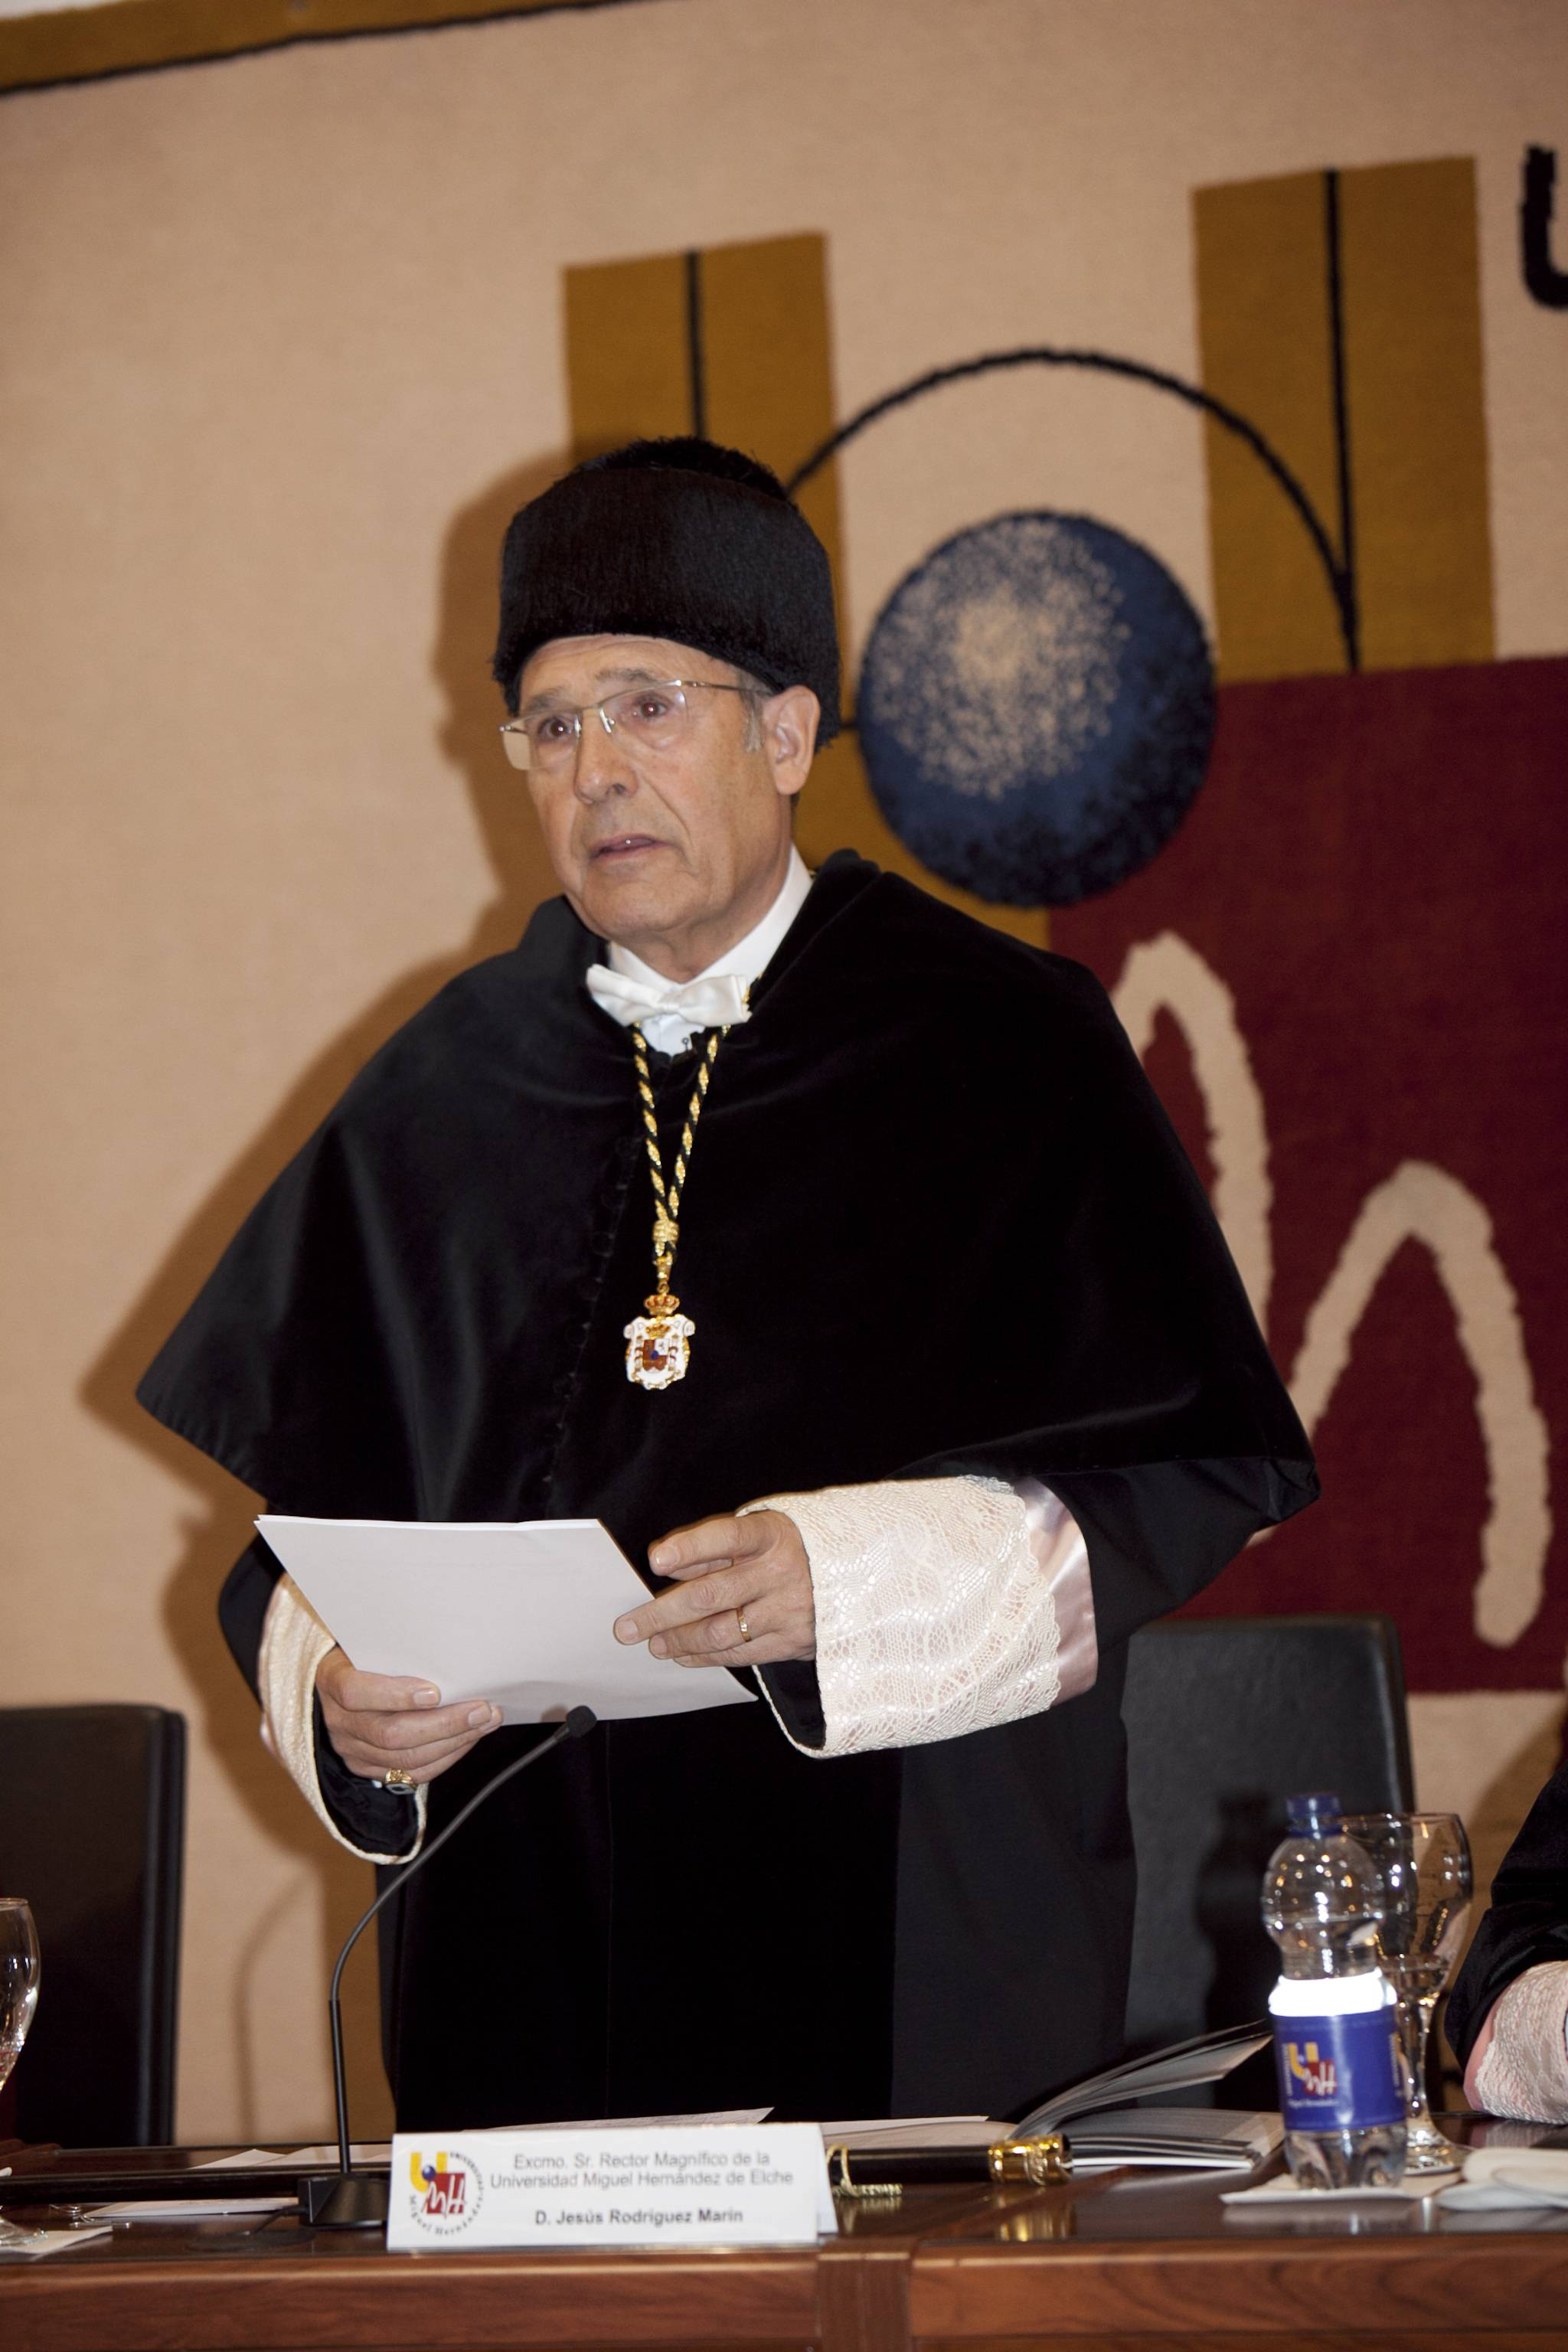 doctor-honoris-causa-luis-gamir_mg_1238.jpg